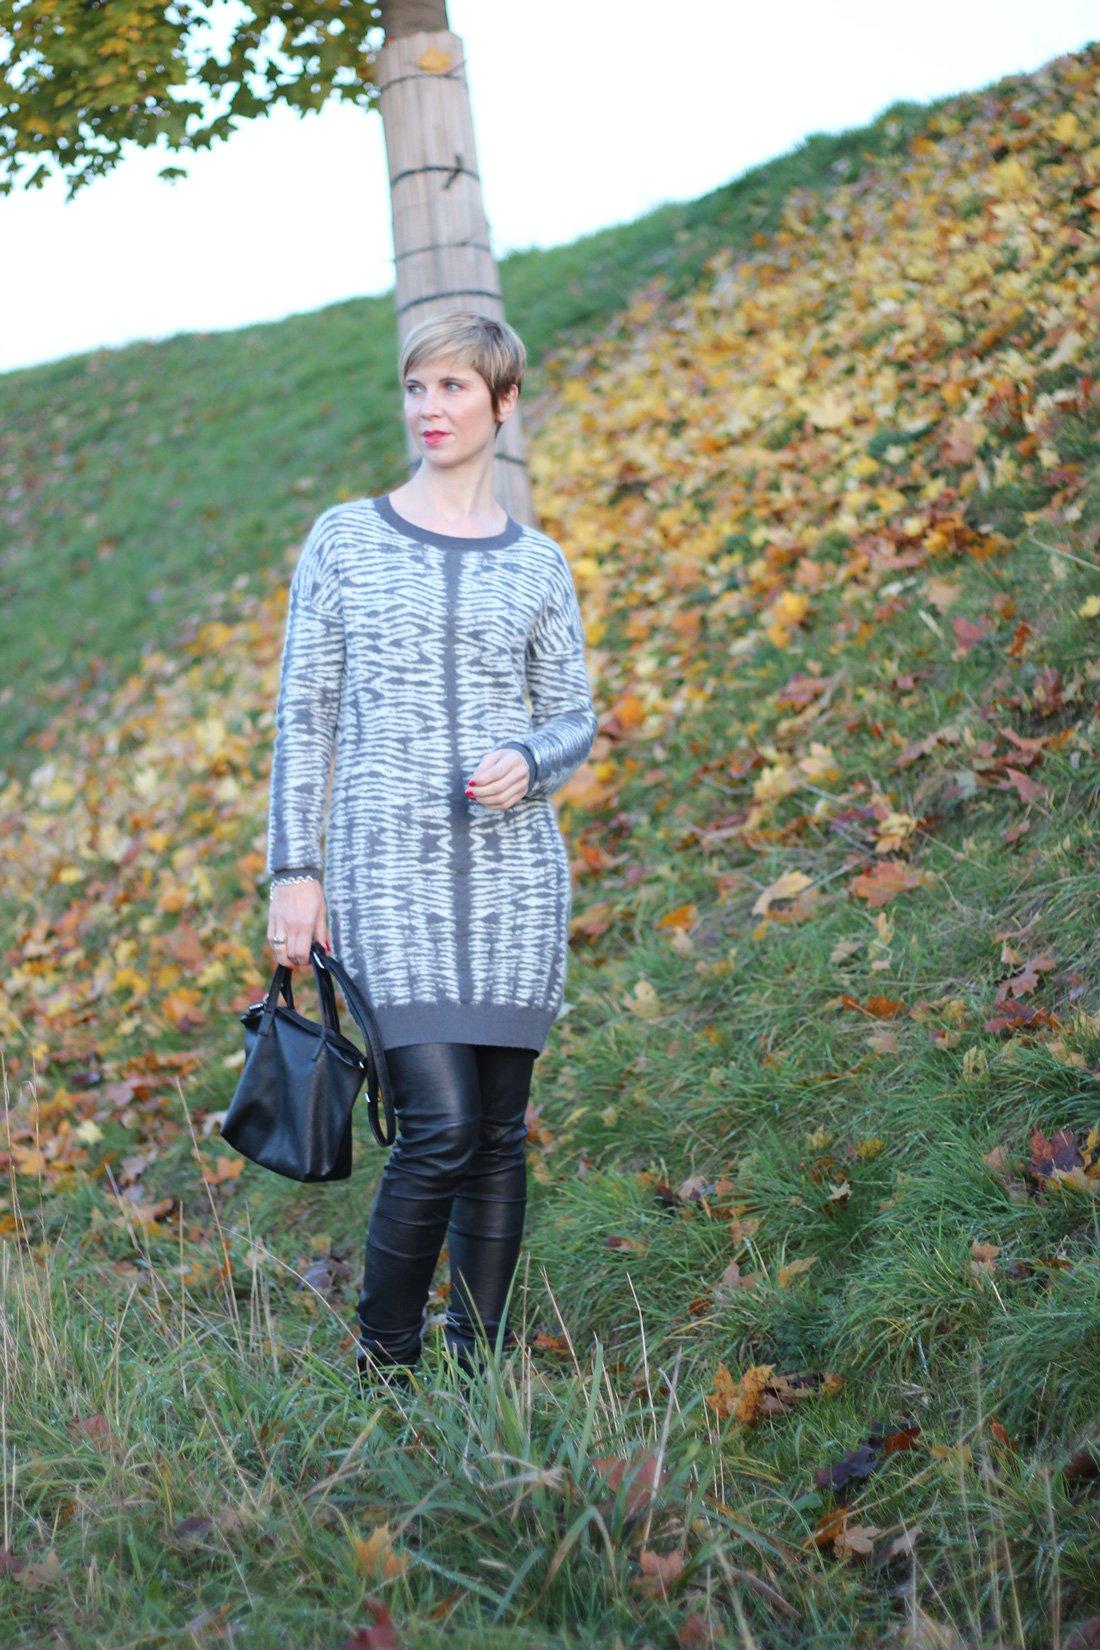 IMG_6691a_Kleid_AllSaints_Herbststyling_ConnyDoll_AHemadundahos_Strickkleid_Fashionblog_Modeblog_40plus